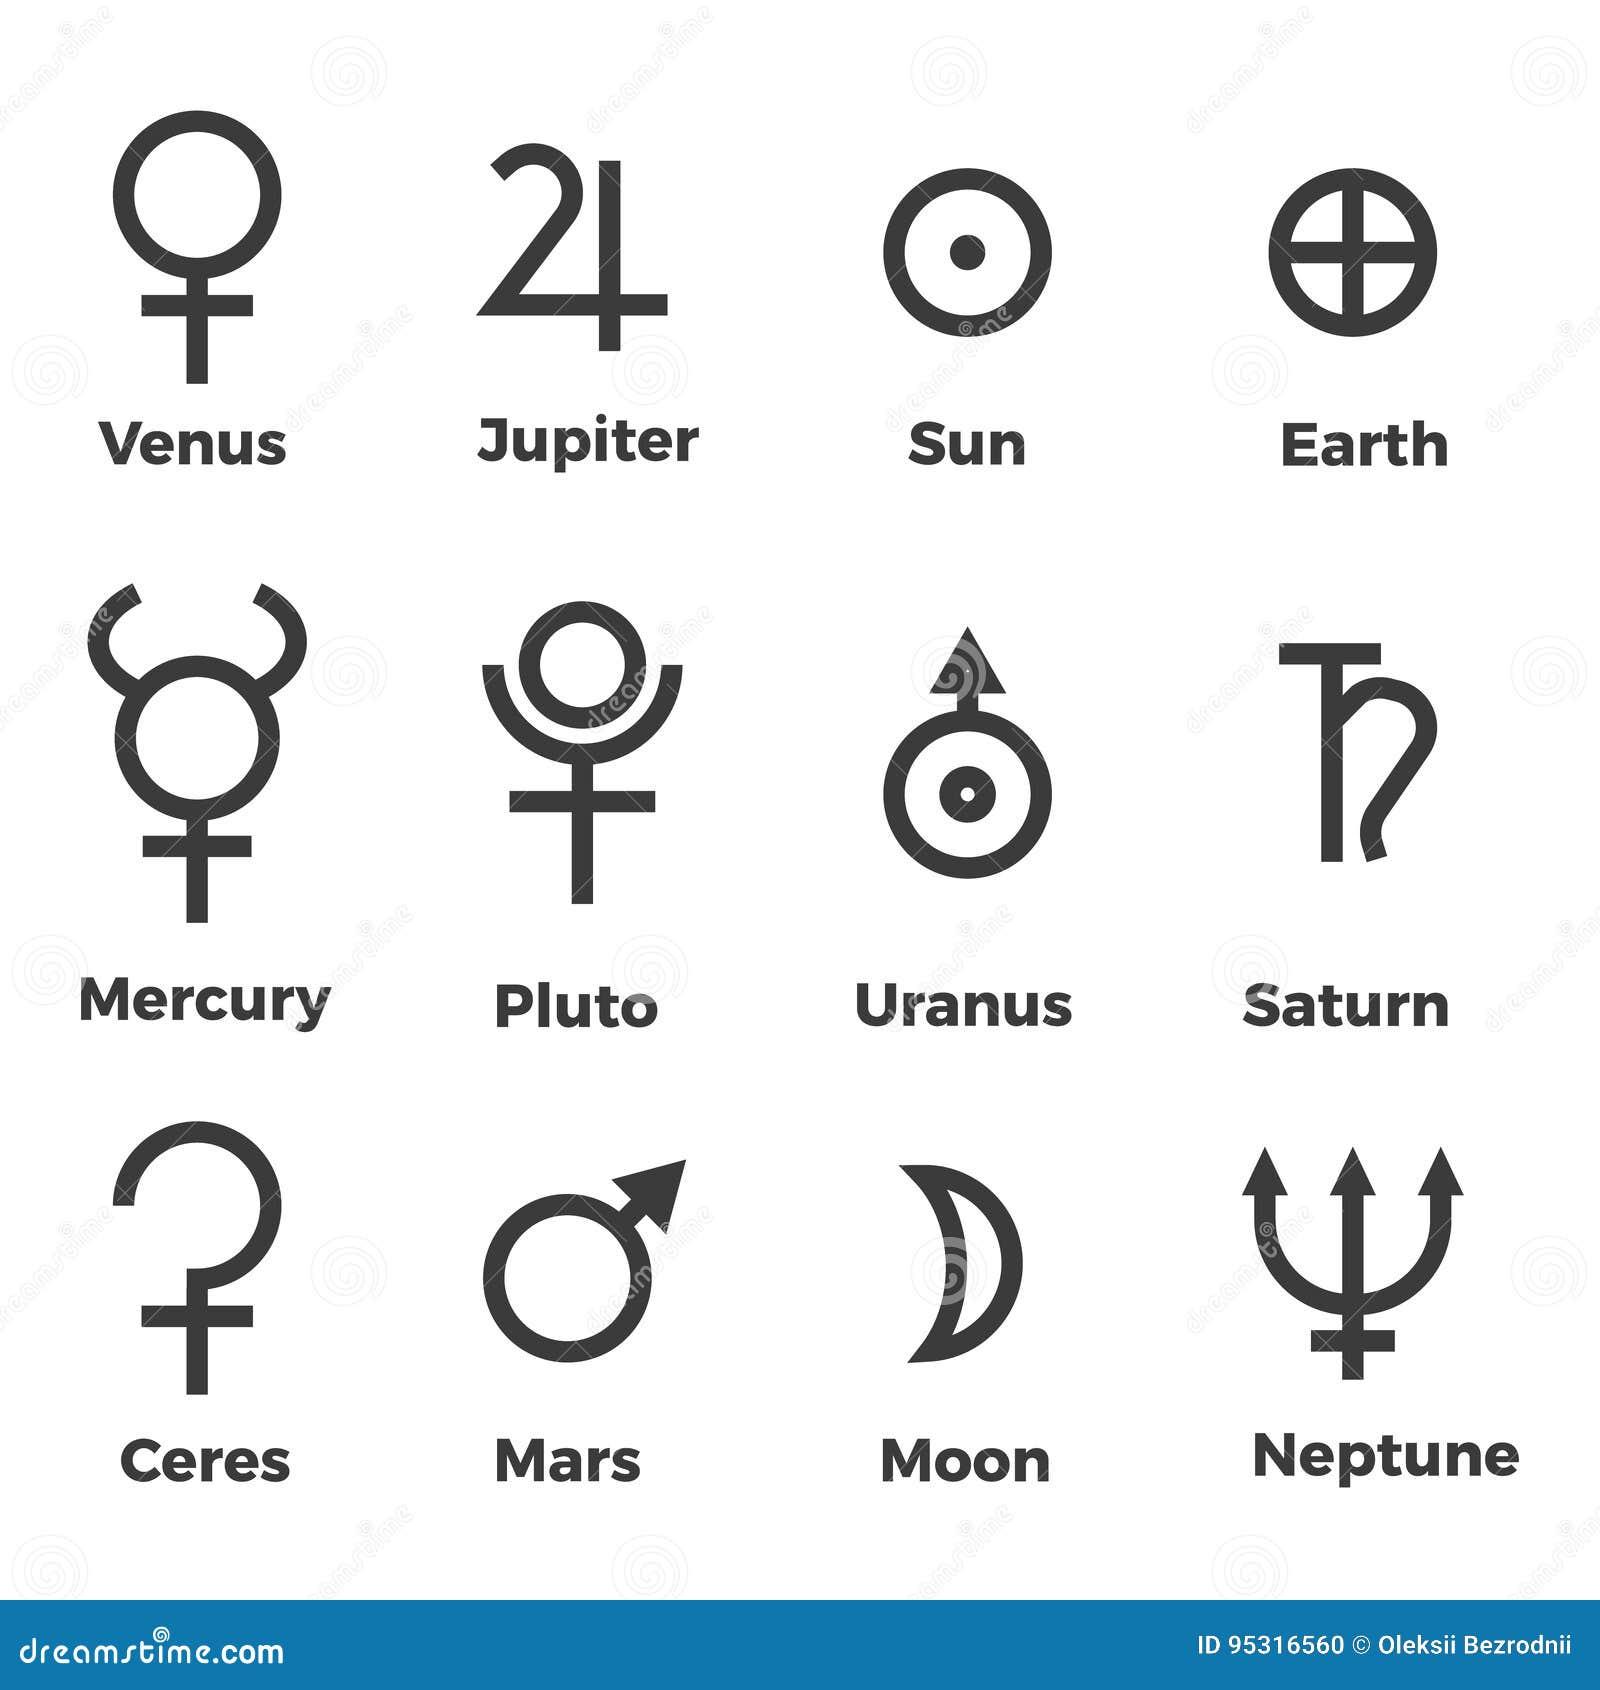 Solar system symbols gallery symbol and sign ideas solar system planets icons set symbols stock vector illustration solar system planets icons set symbols buycottarizona buycottarizona